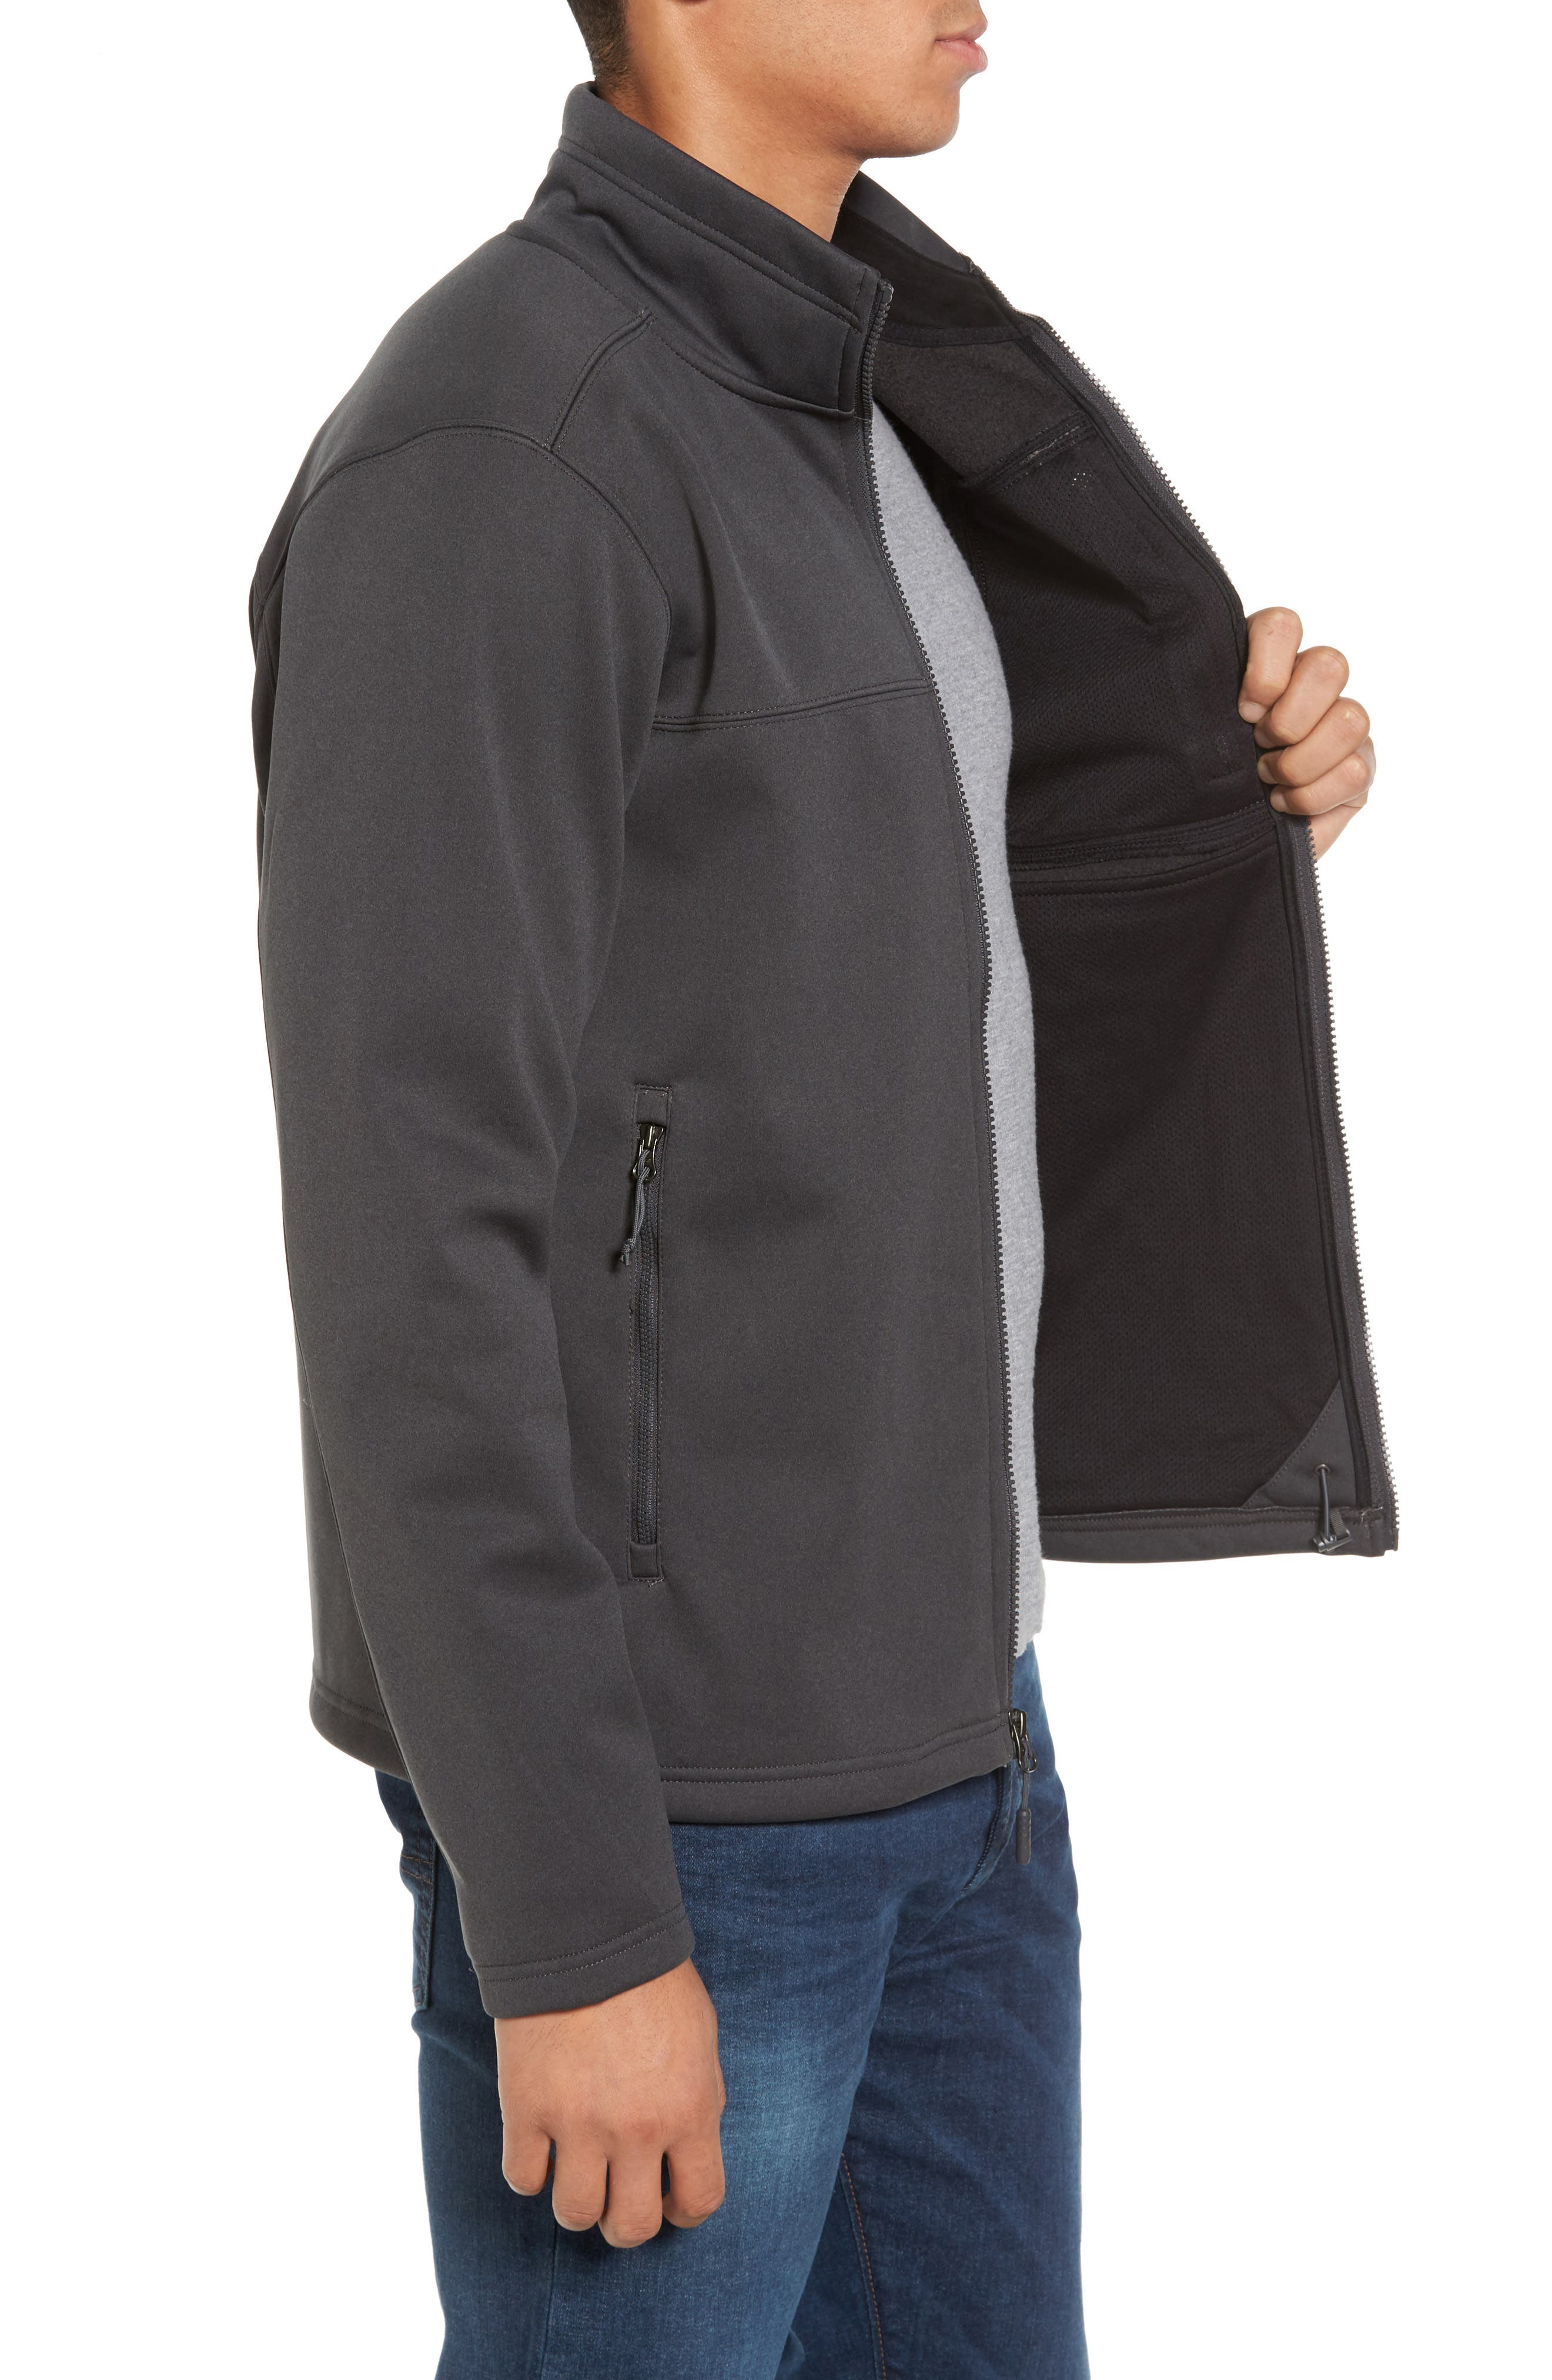 Apex Risor Jacket,                             Alternate thumbnail 10, color,